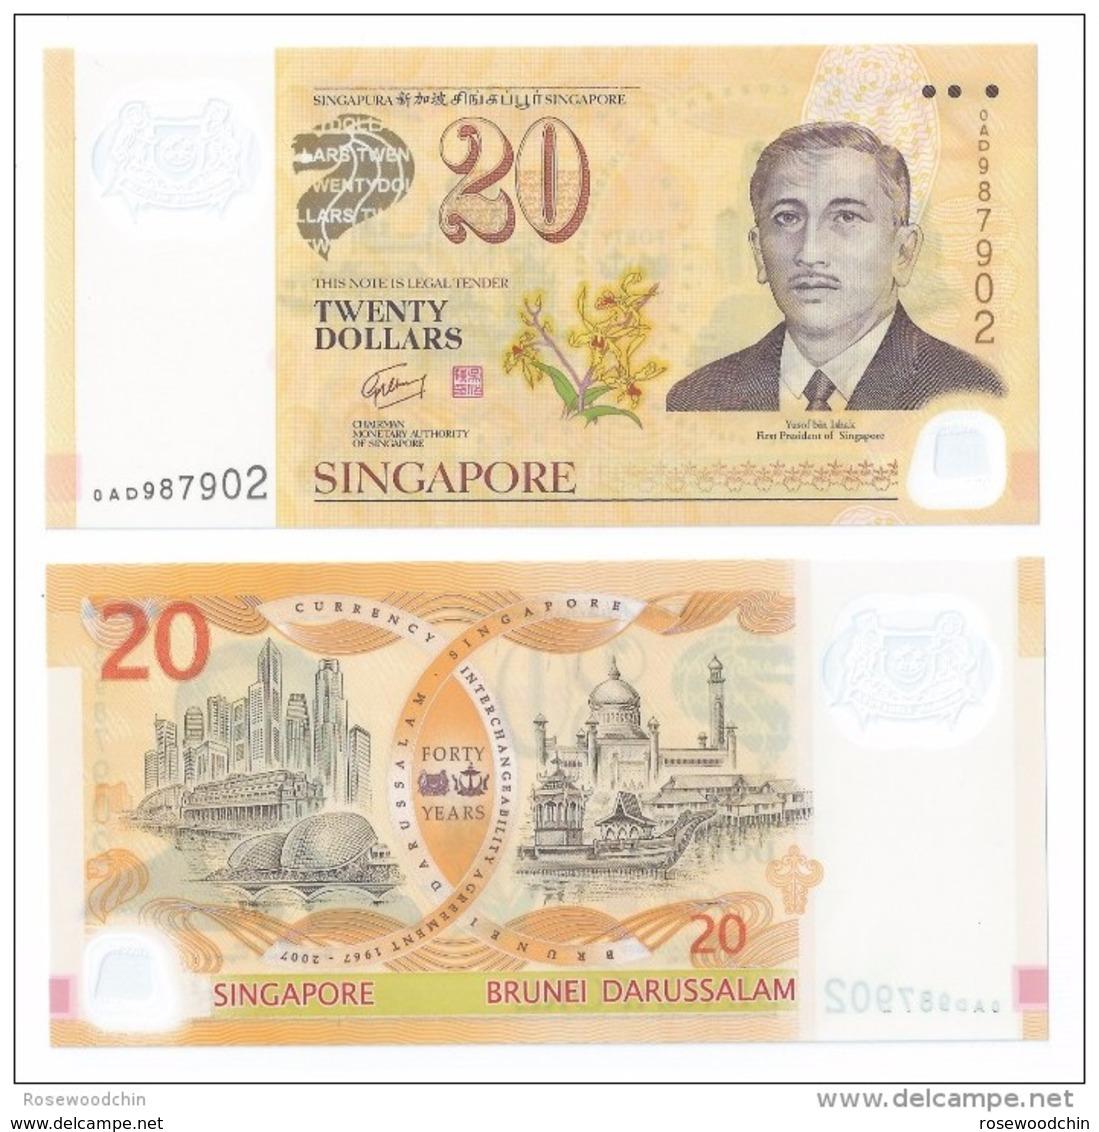 2007 SINGAPORE BRUNEI 40th ANNIVERSARY $20  POLYMER BANKNOTE  NEW UNC  (#78) - Singapore